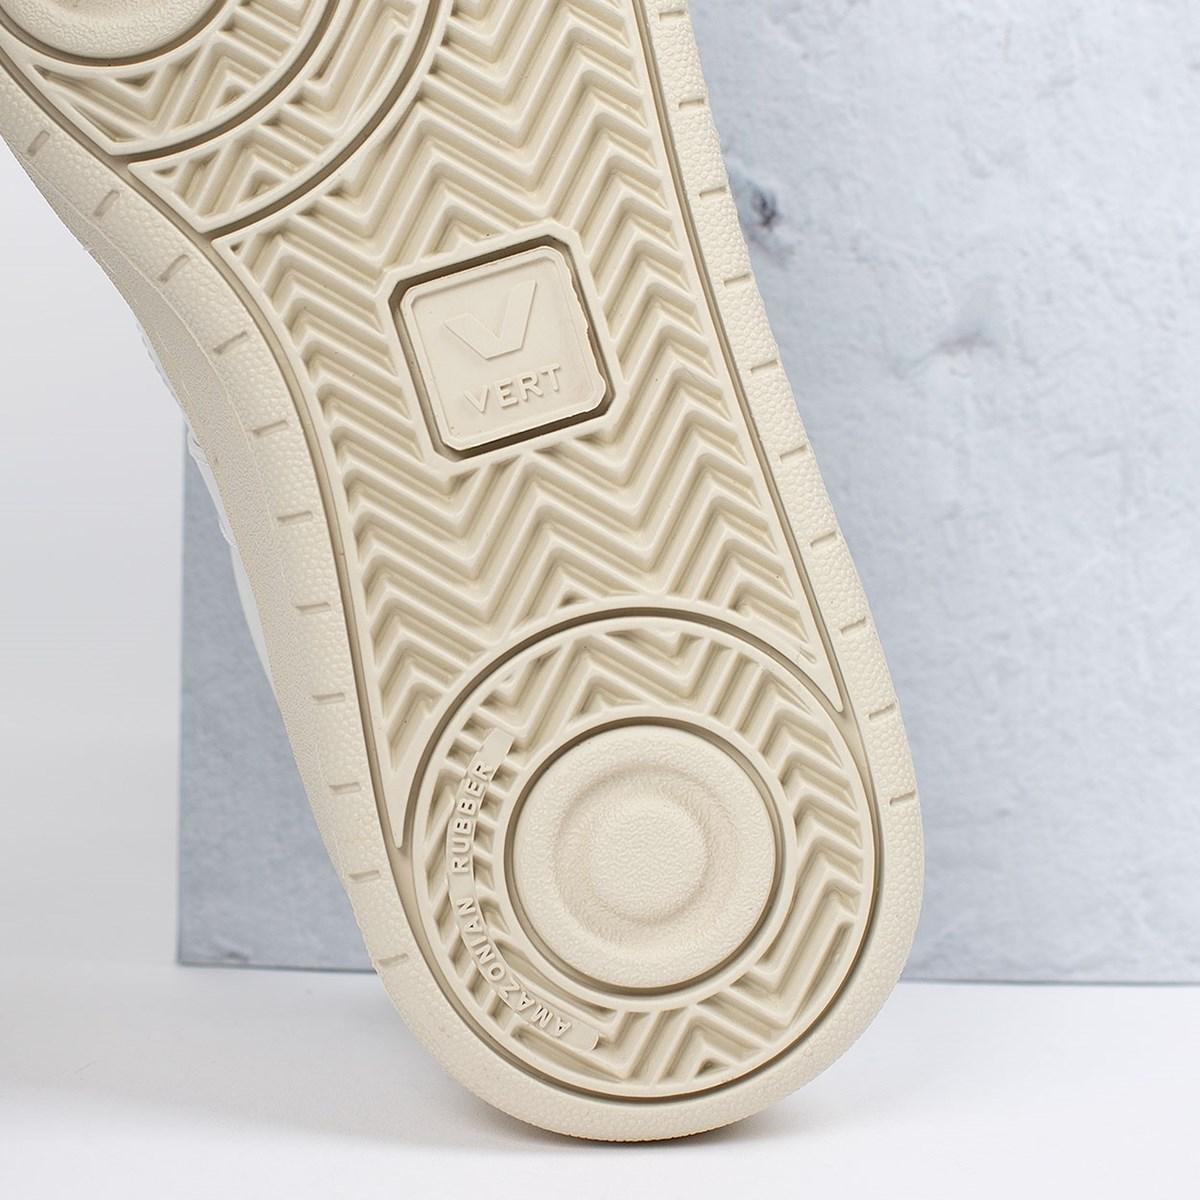 Tênis Vert Shoes V-12 Leather Extra White XD022297